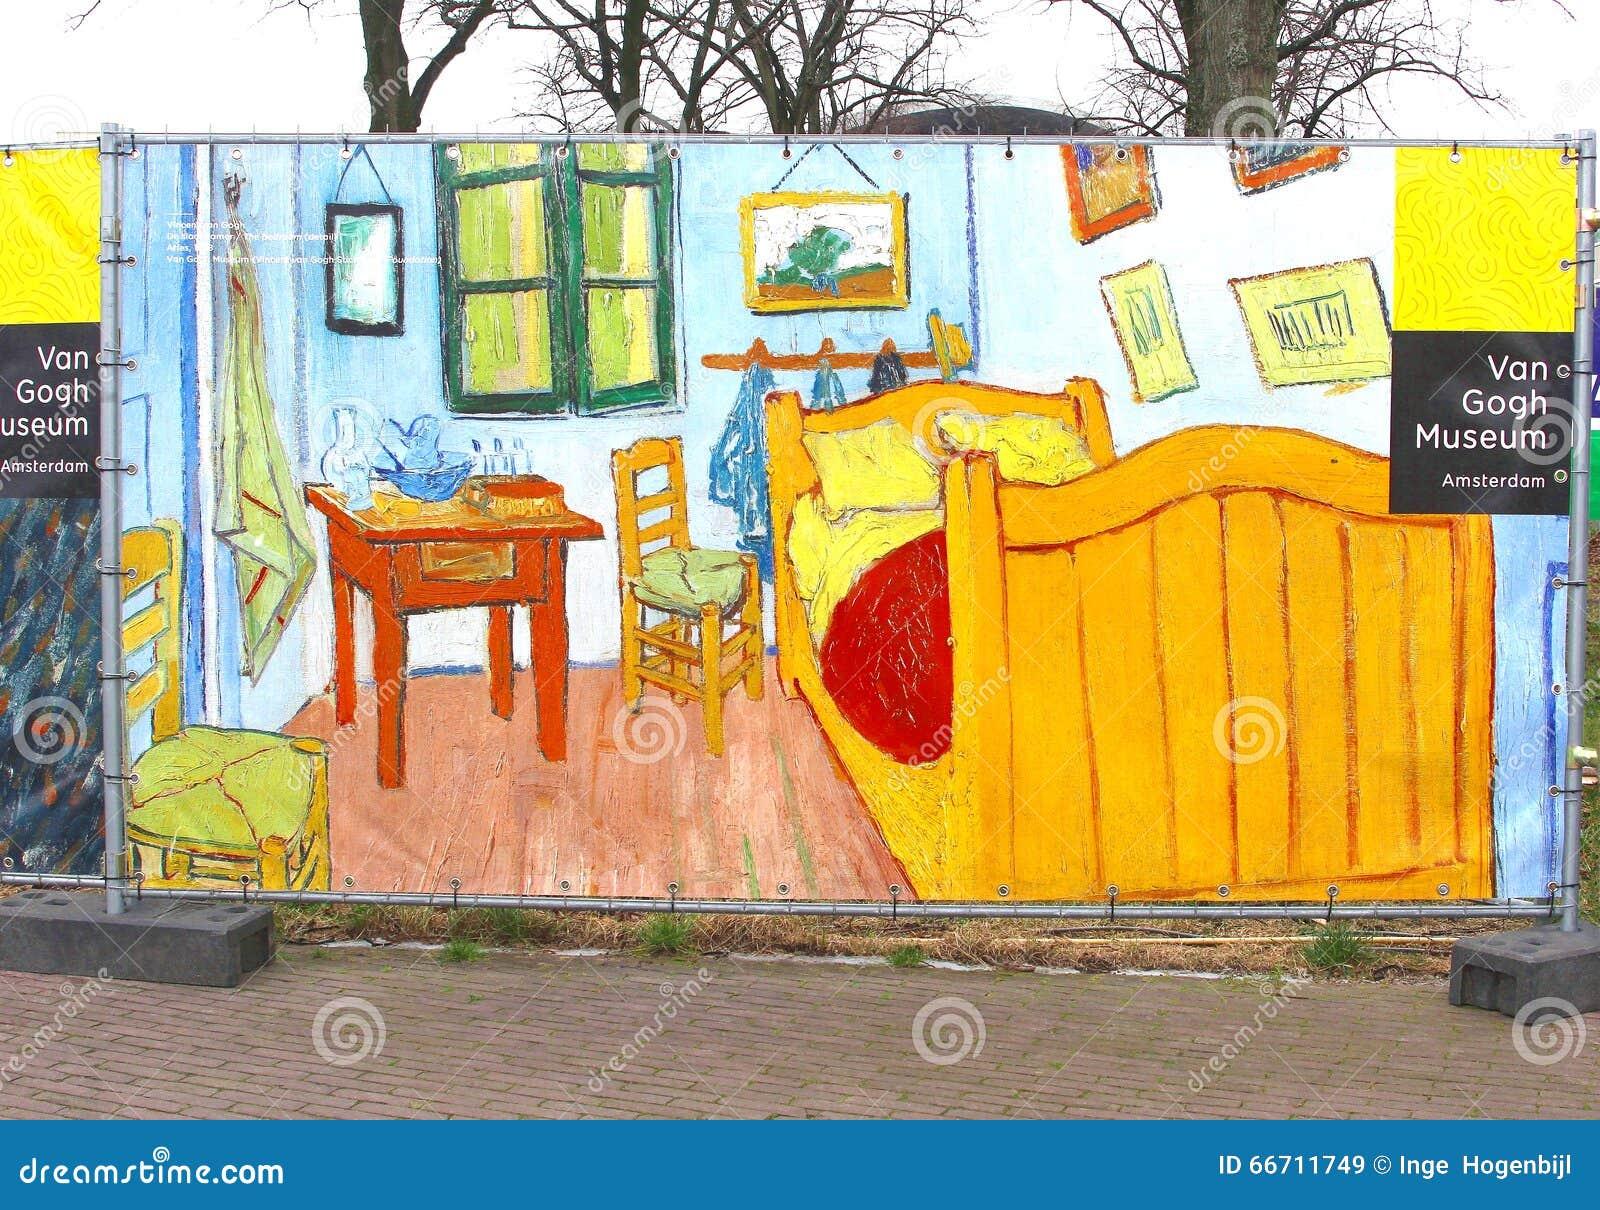 Szyldowa Poczta Vincent Van Gogh Muzeum Amsterdam Obraz